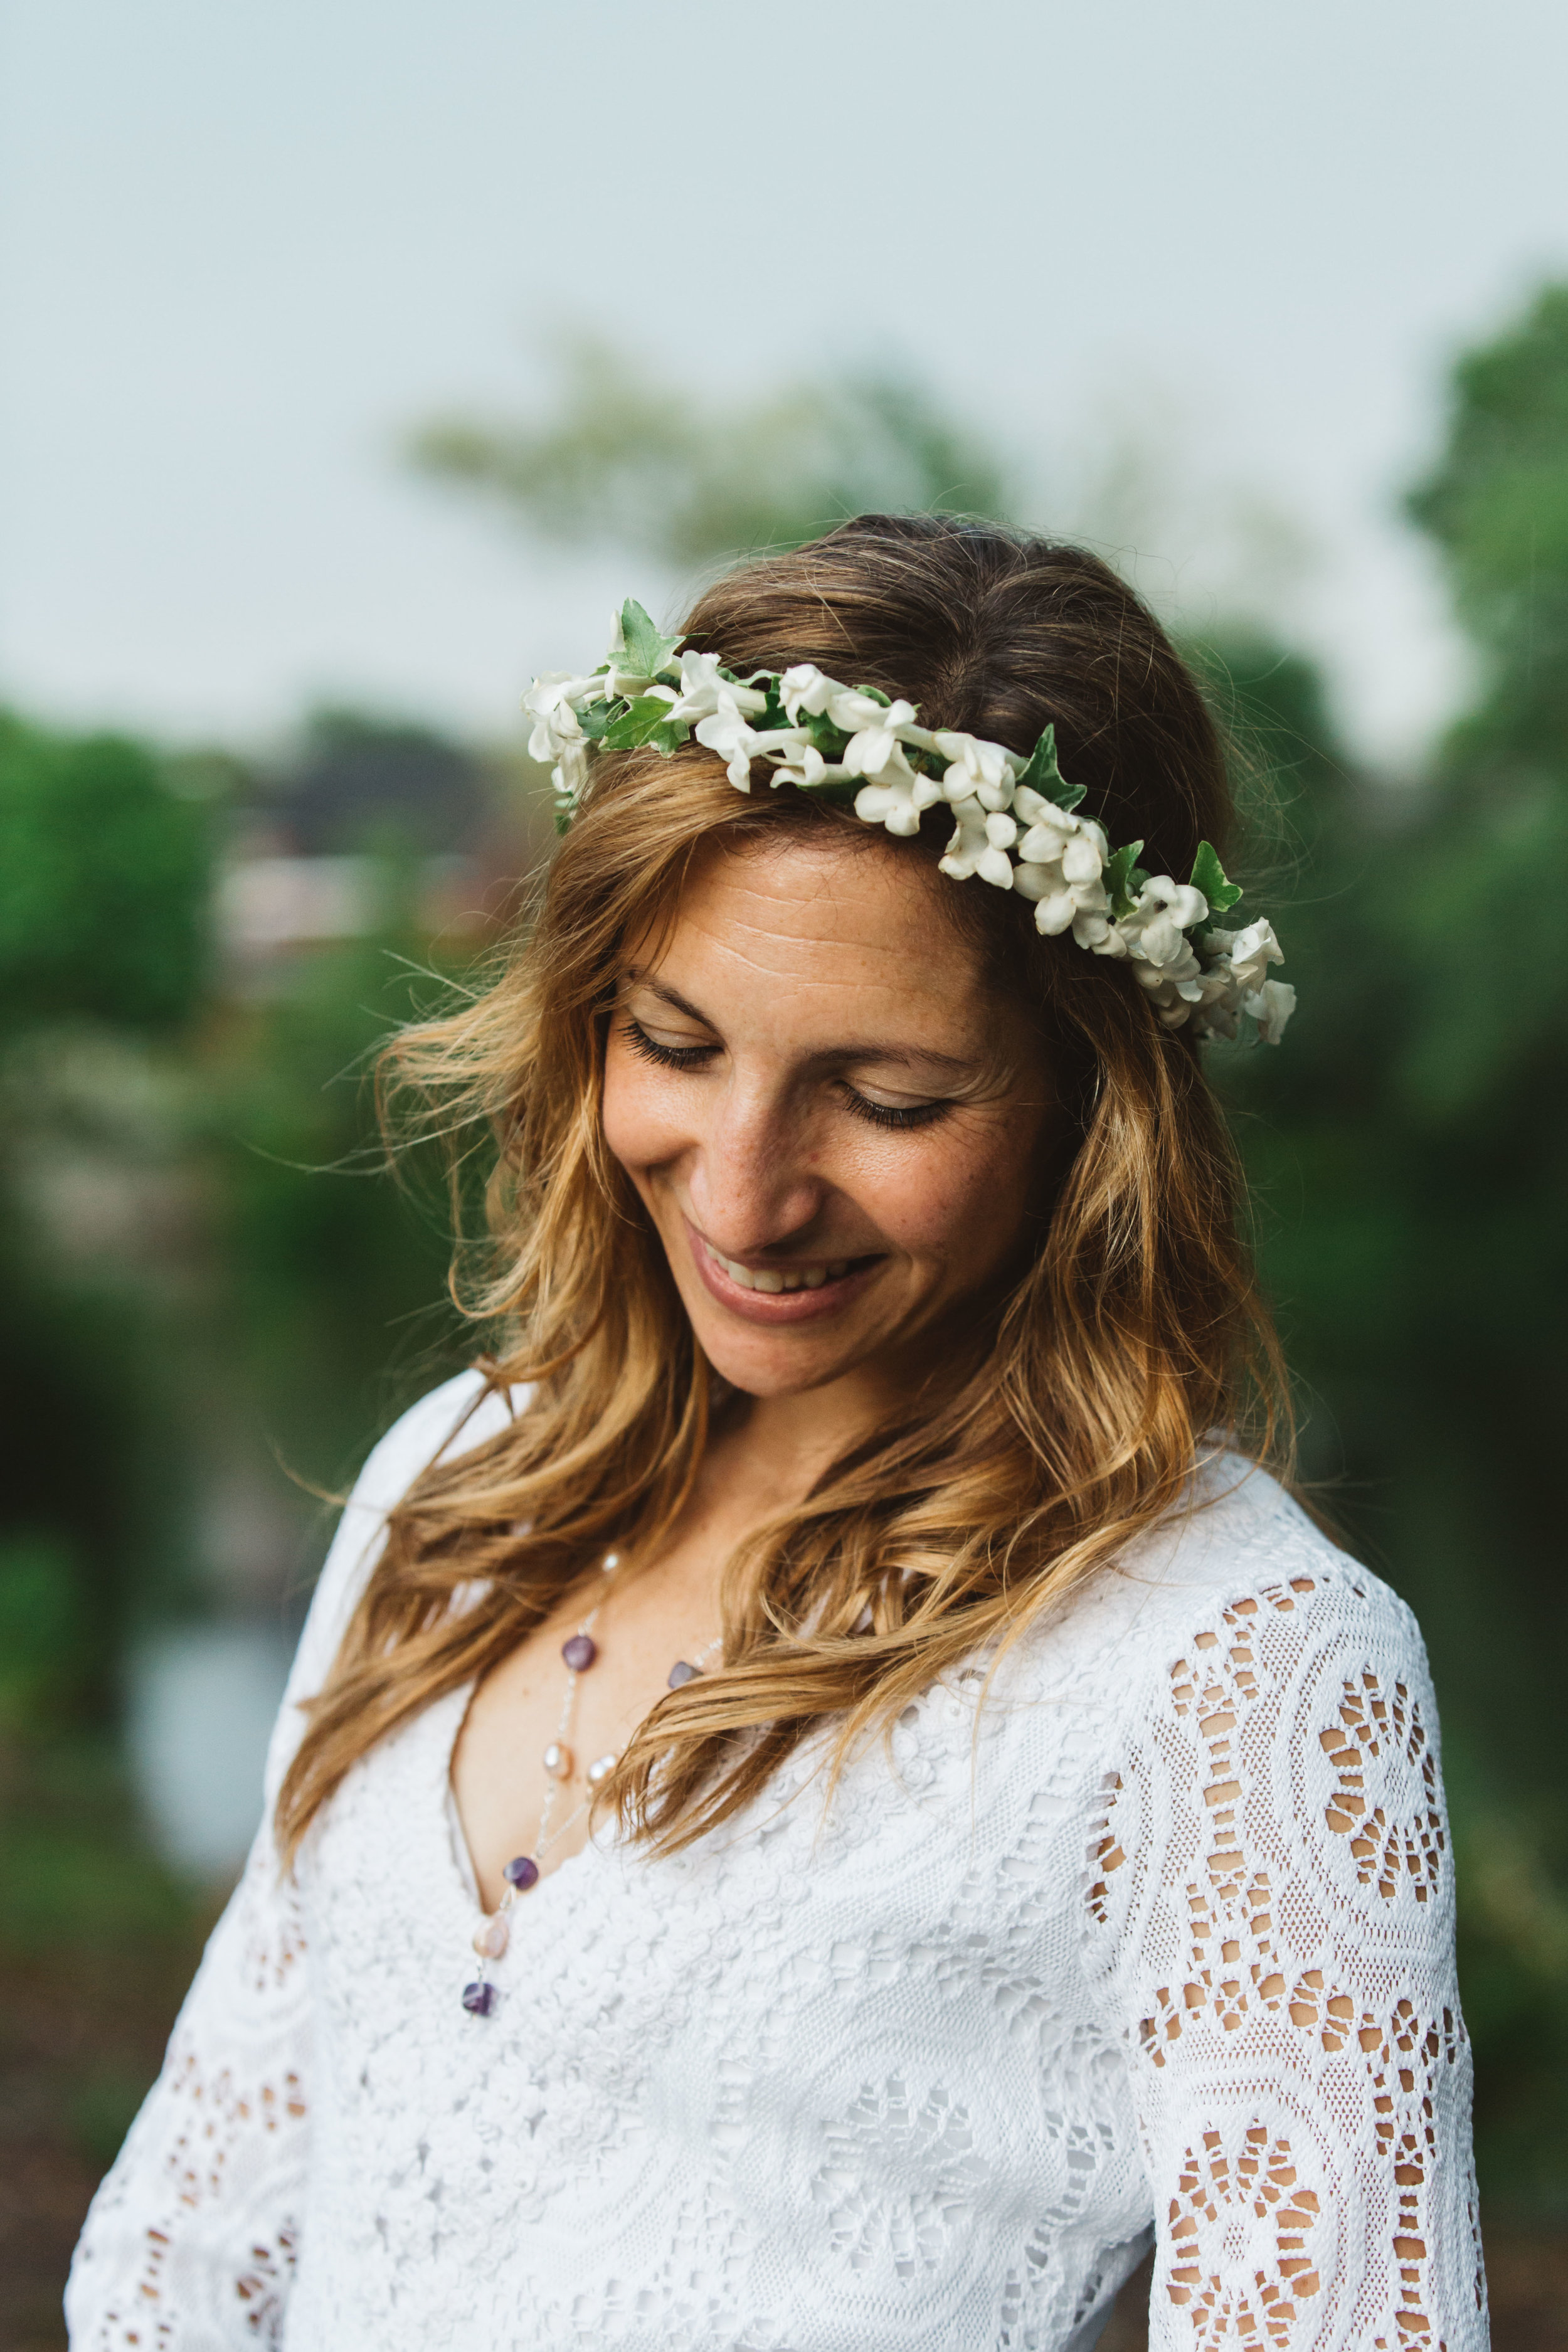 A portrait of Elizabeth and her drool-worthy floral crown - Elizabeth & Sean's intimate Attleboro wedding